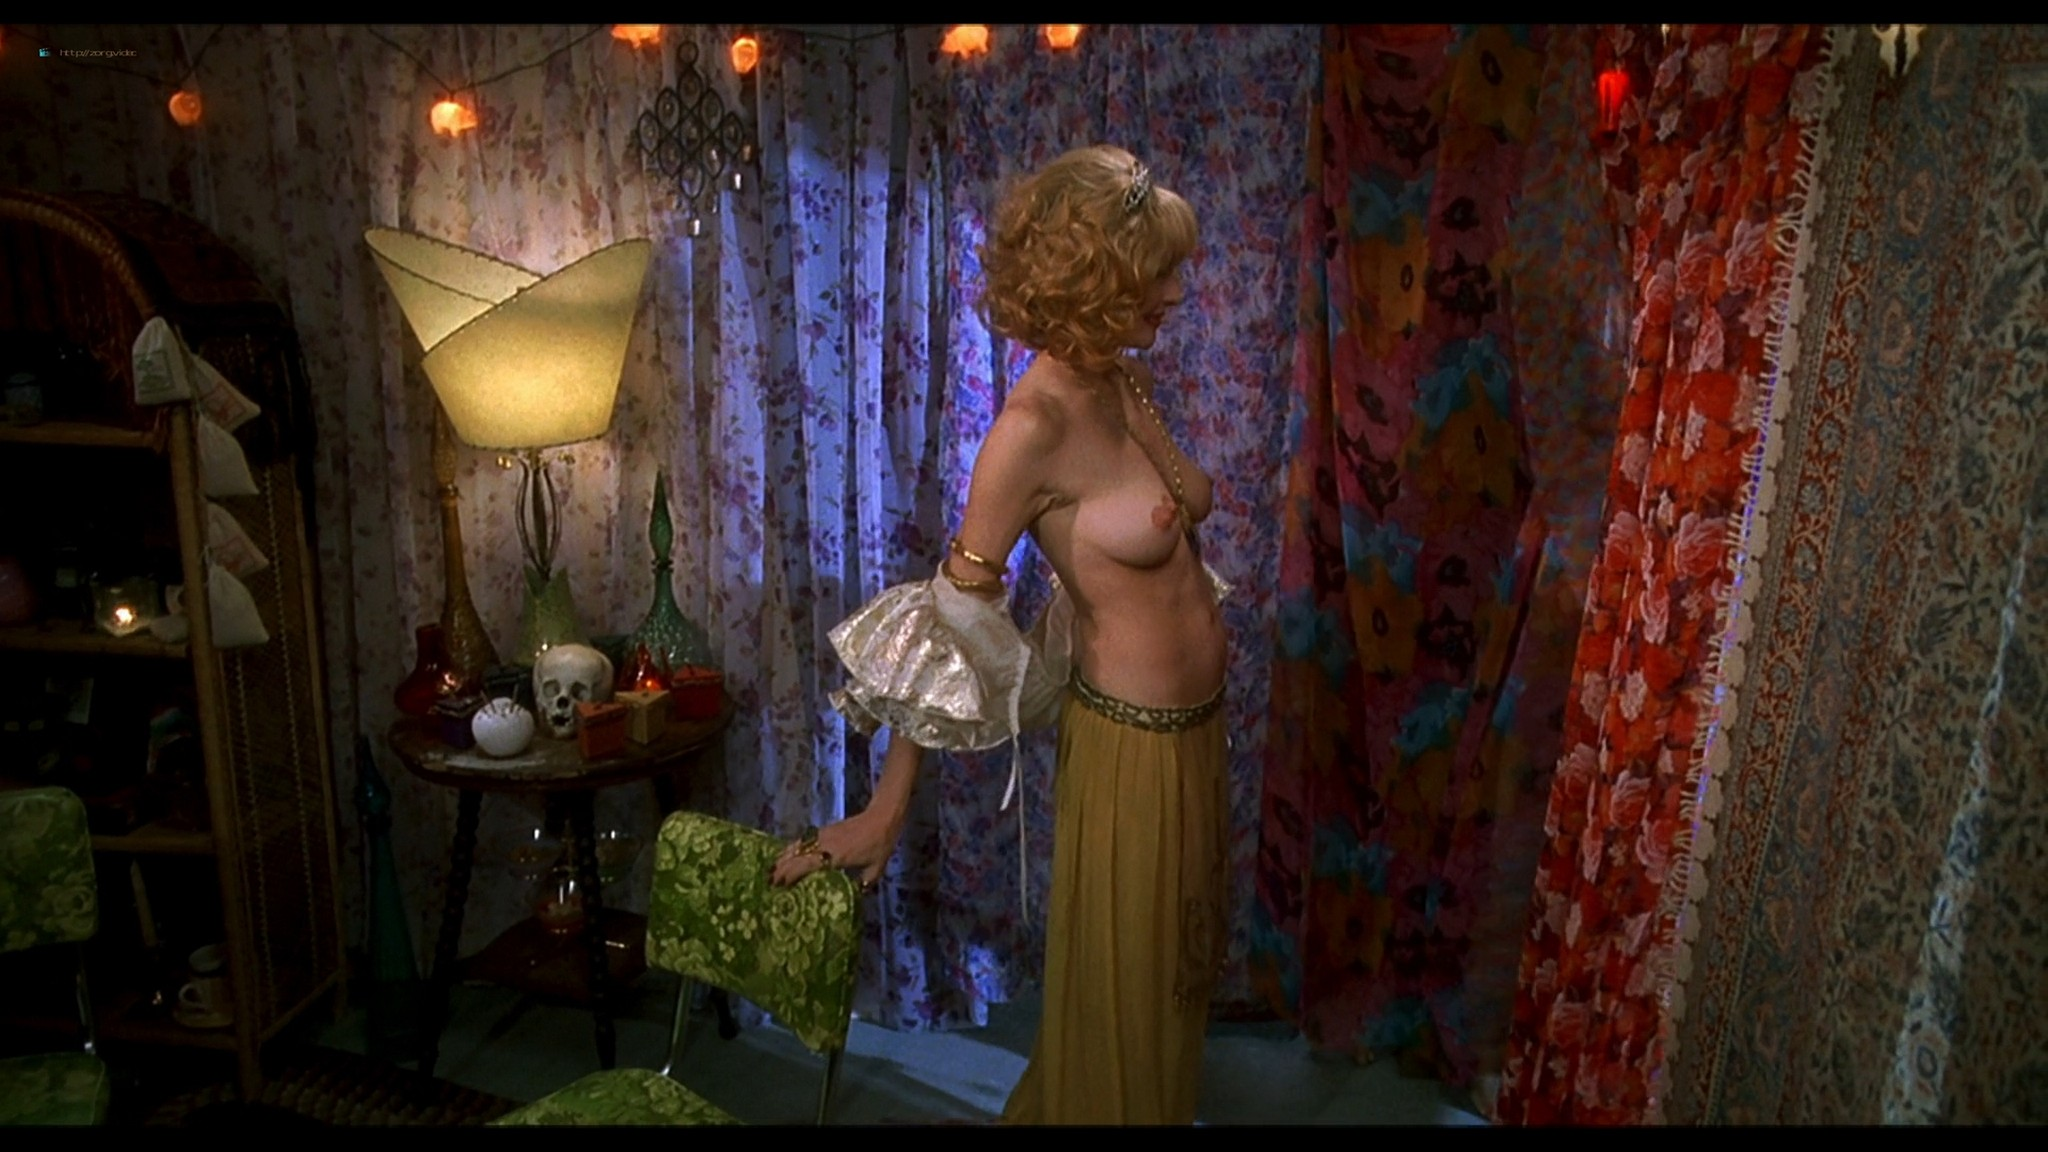 Joey Lauren Adams nude Priscilla Barnes nude topless - Mallrats (1995) HD 1080p BluRay (5)